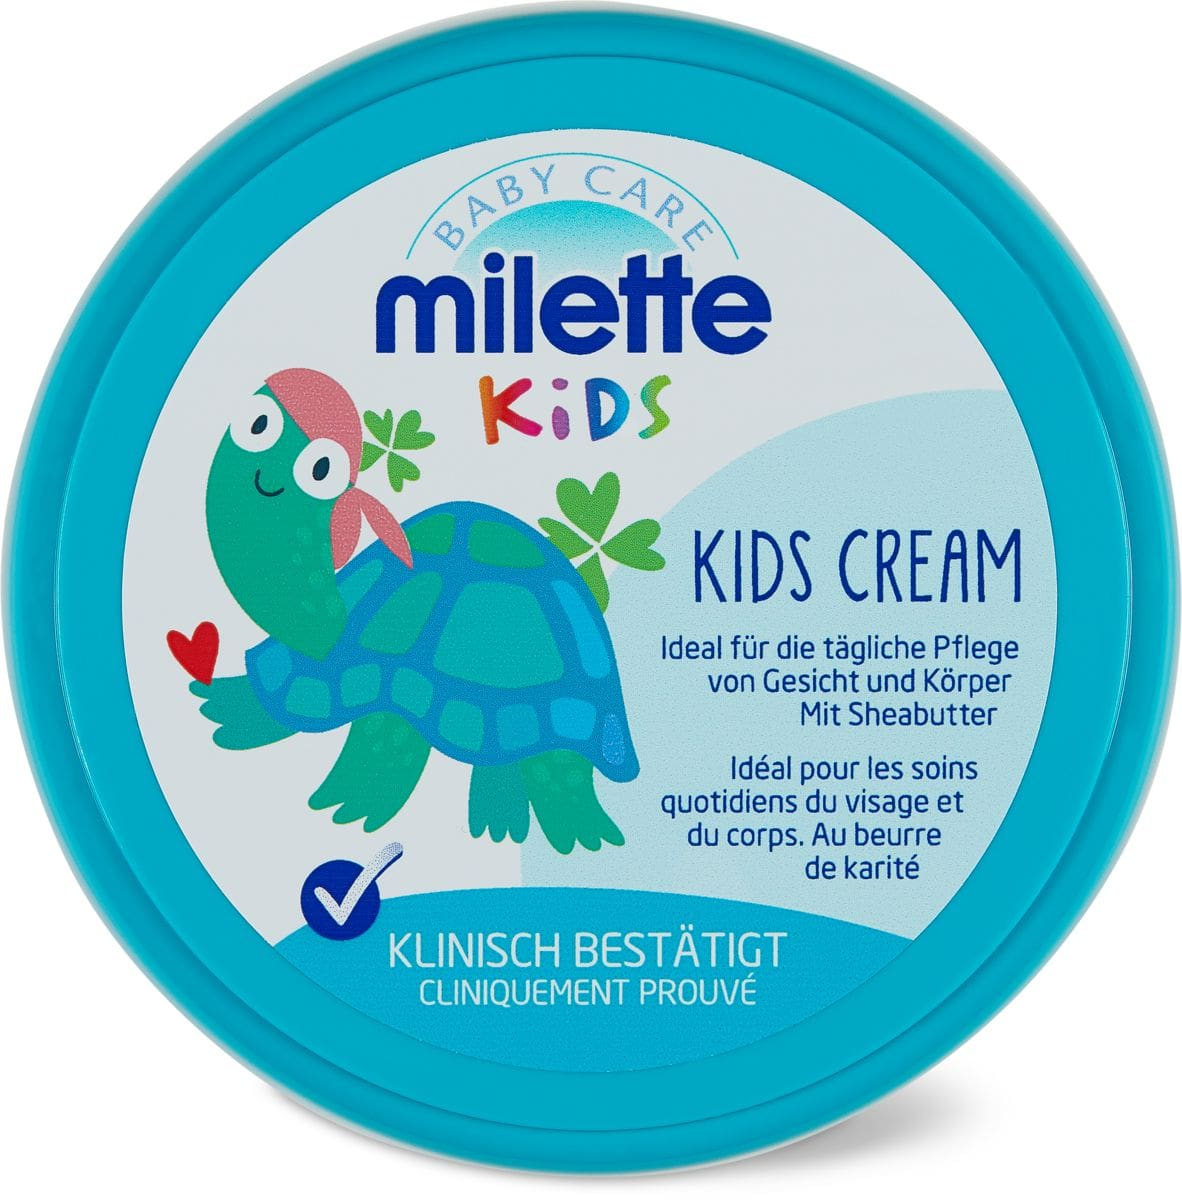 Milette Kids Creme